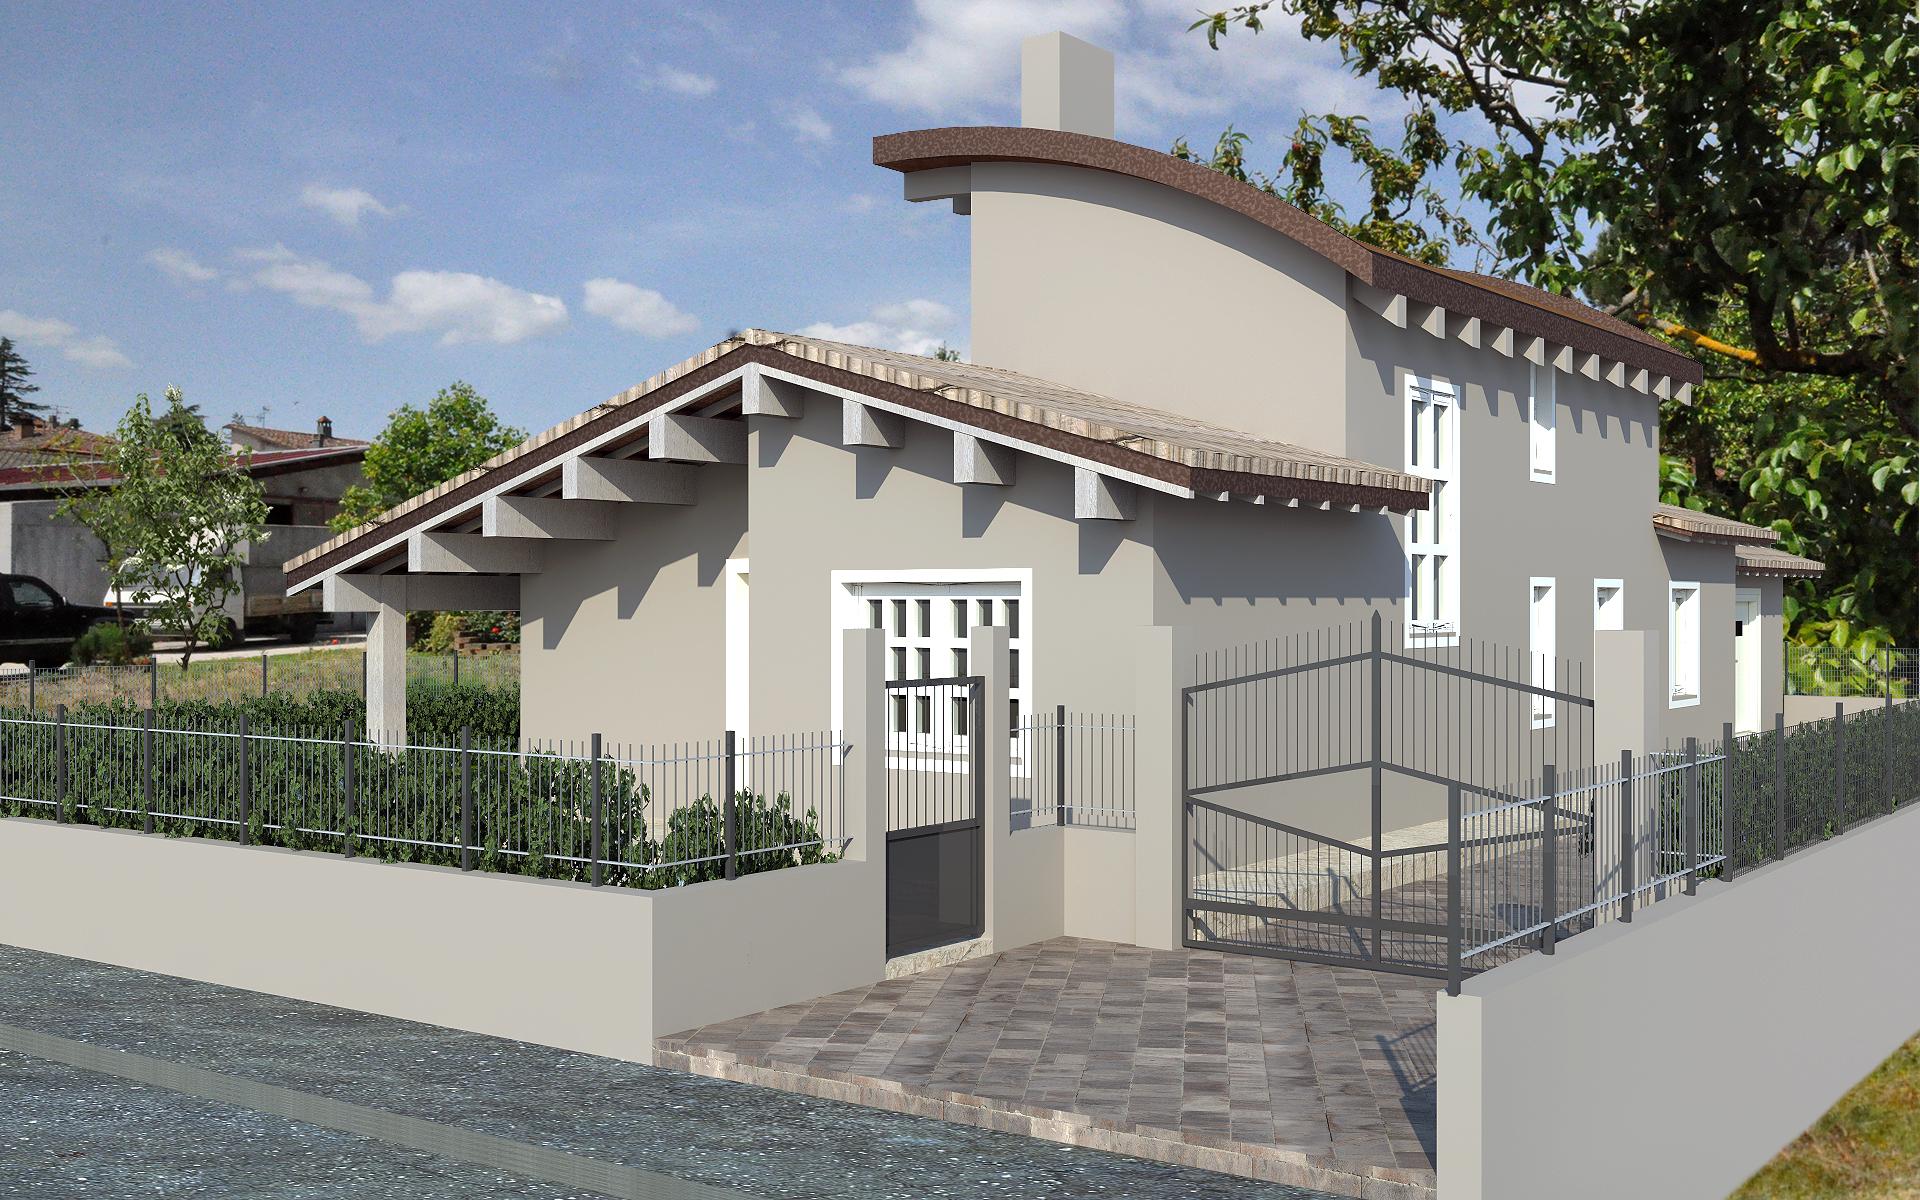 Villino residenziale